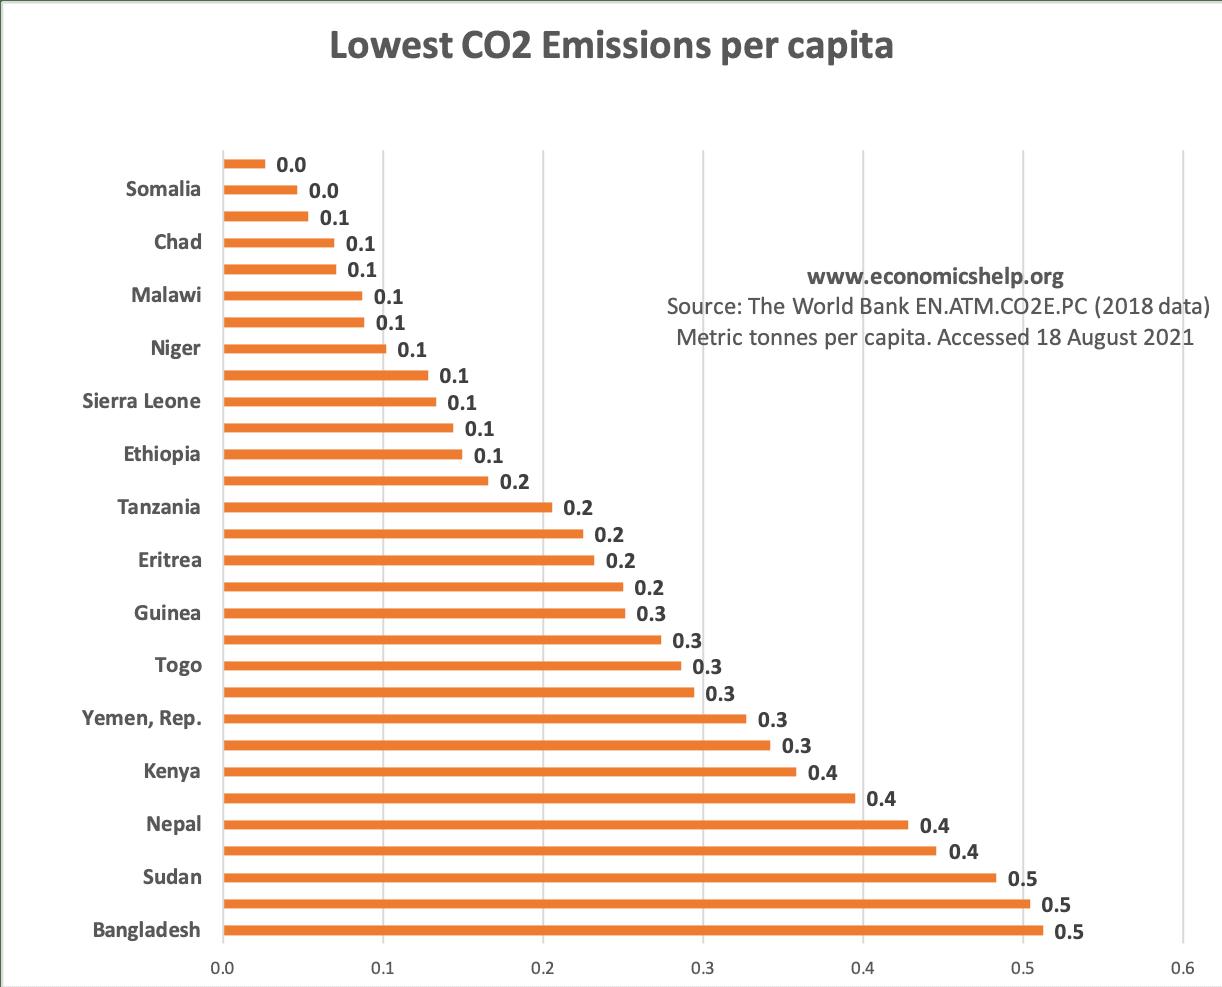 lowest-co2-emissions-per-capita